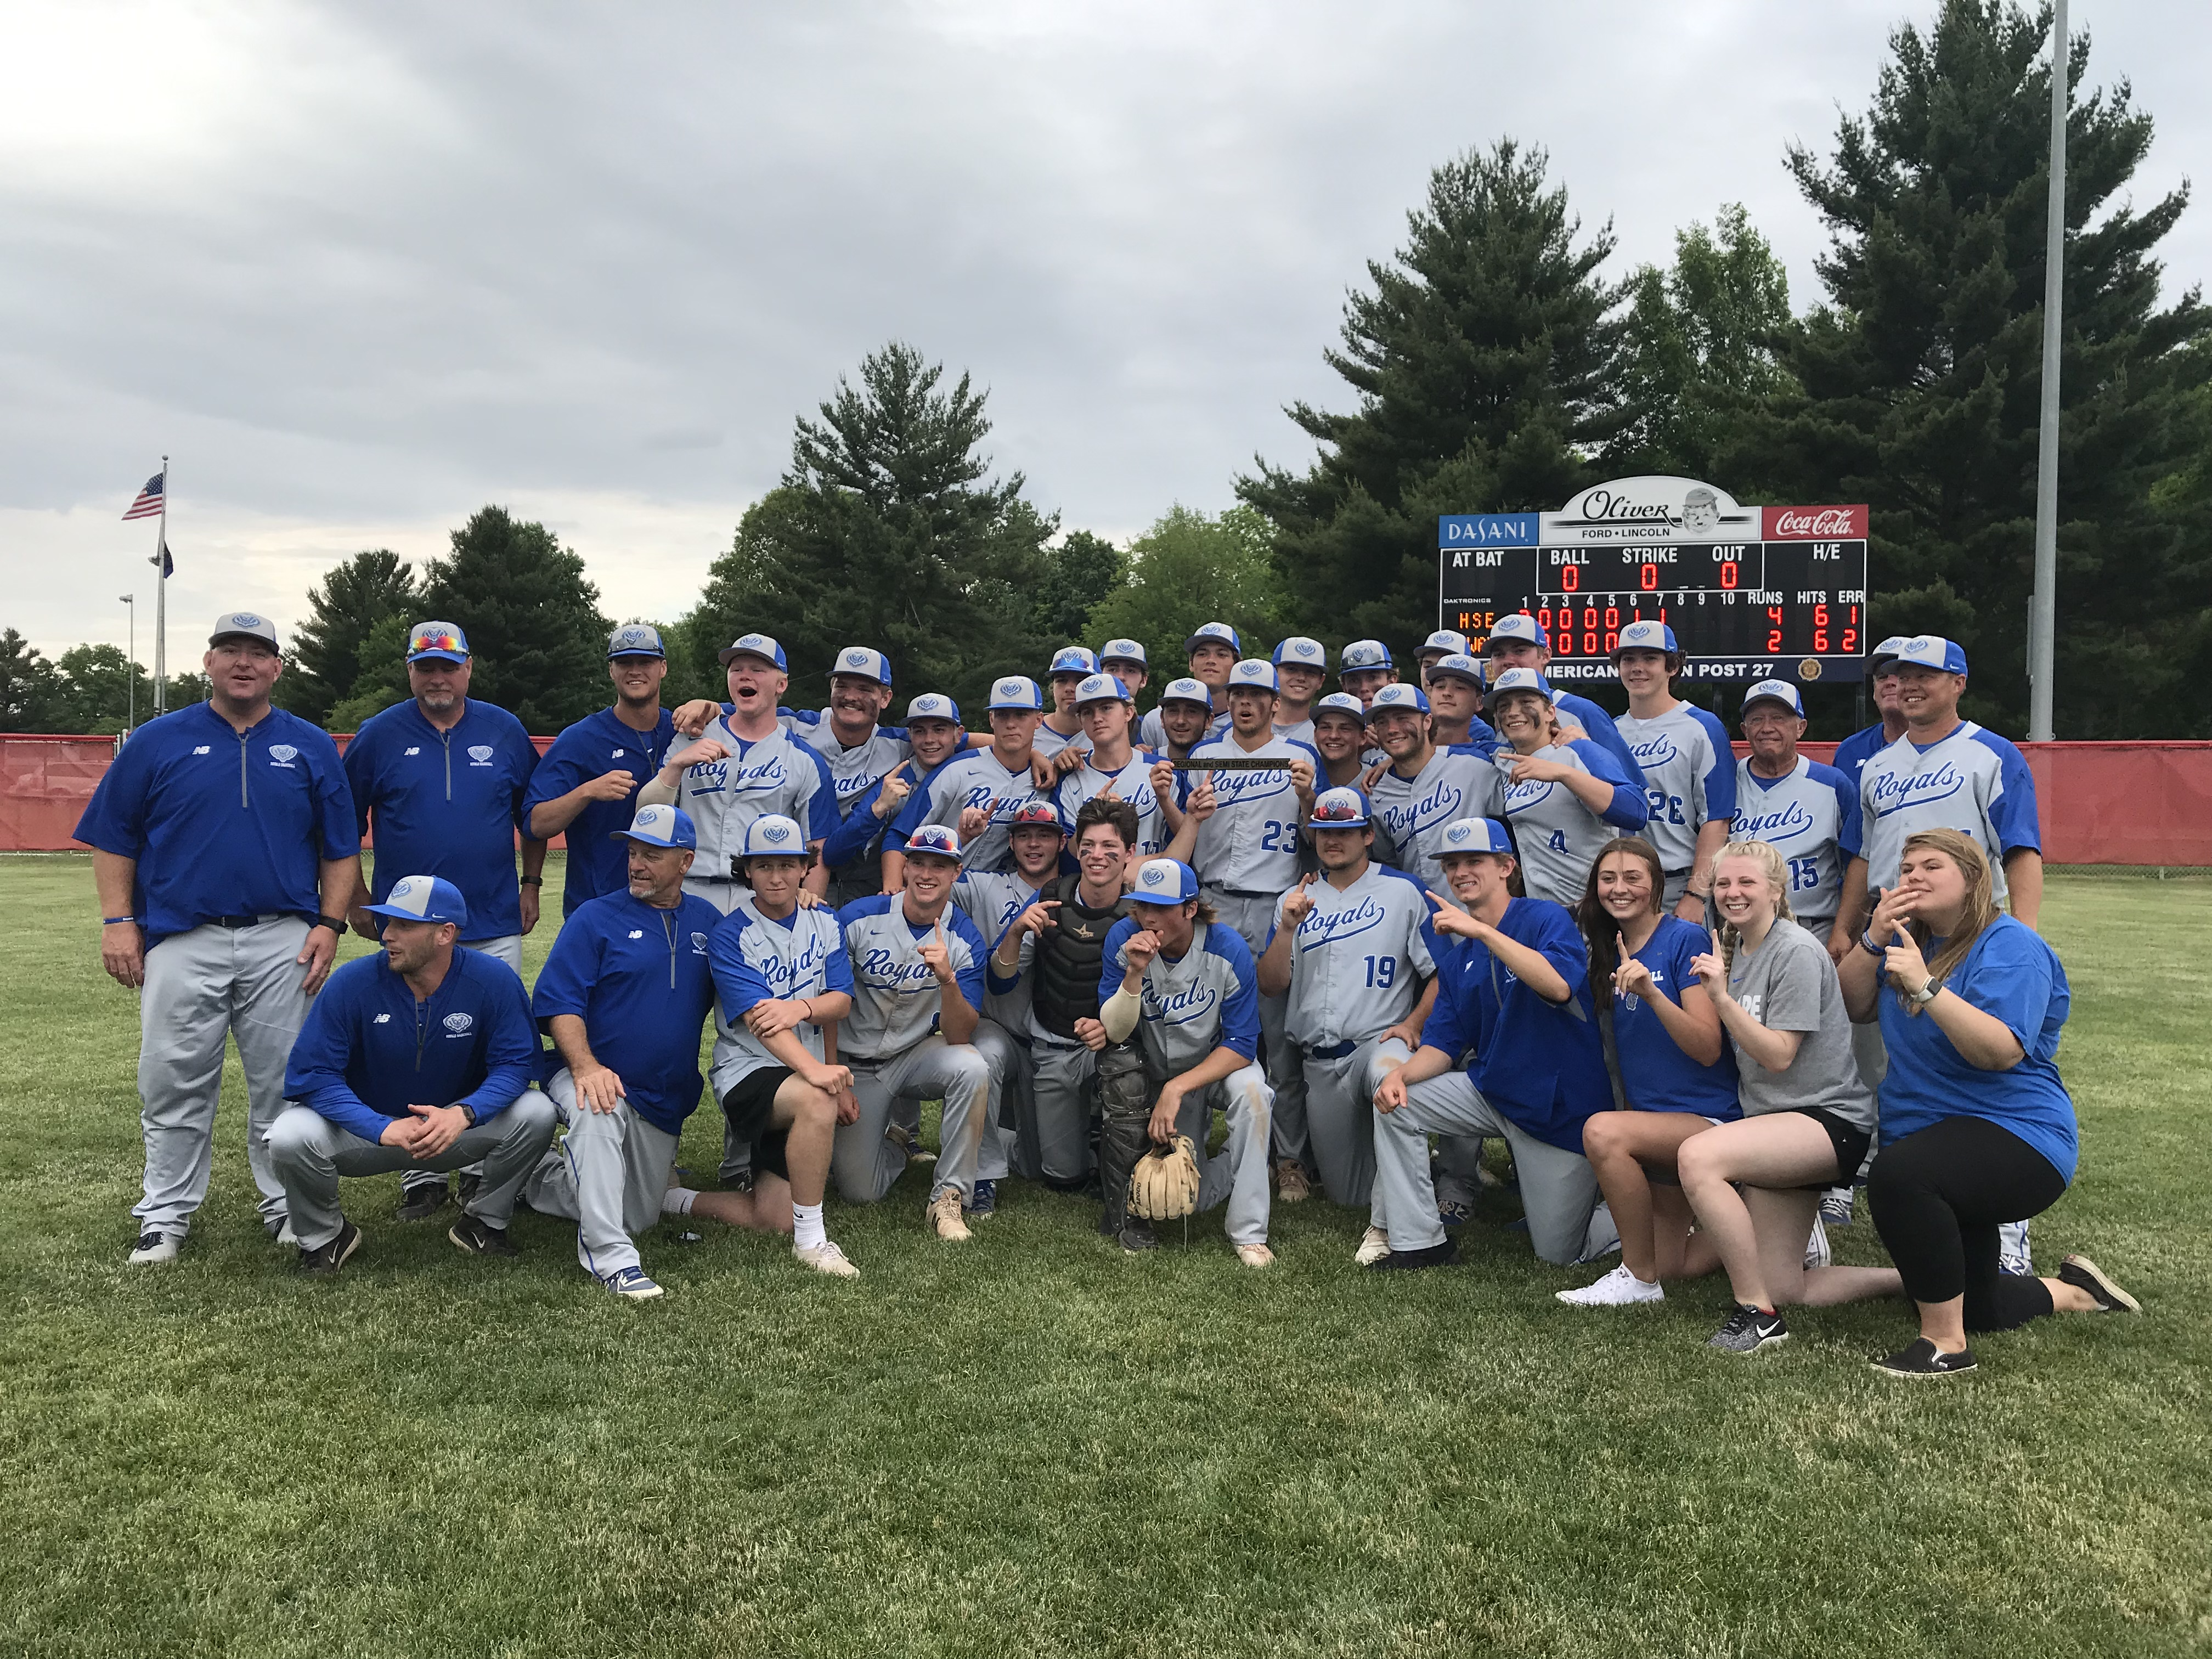 Hamilton Southeastern Royals Varsity Walks Away Victorious Over Mishawaka, 4-2 in Semi-State Championship